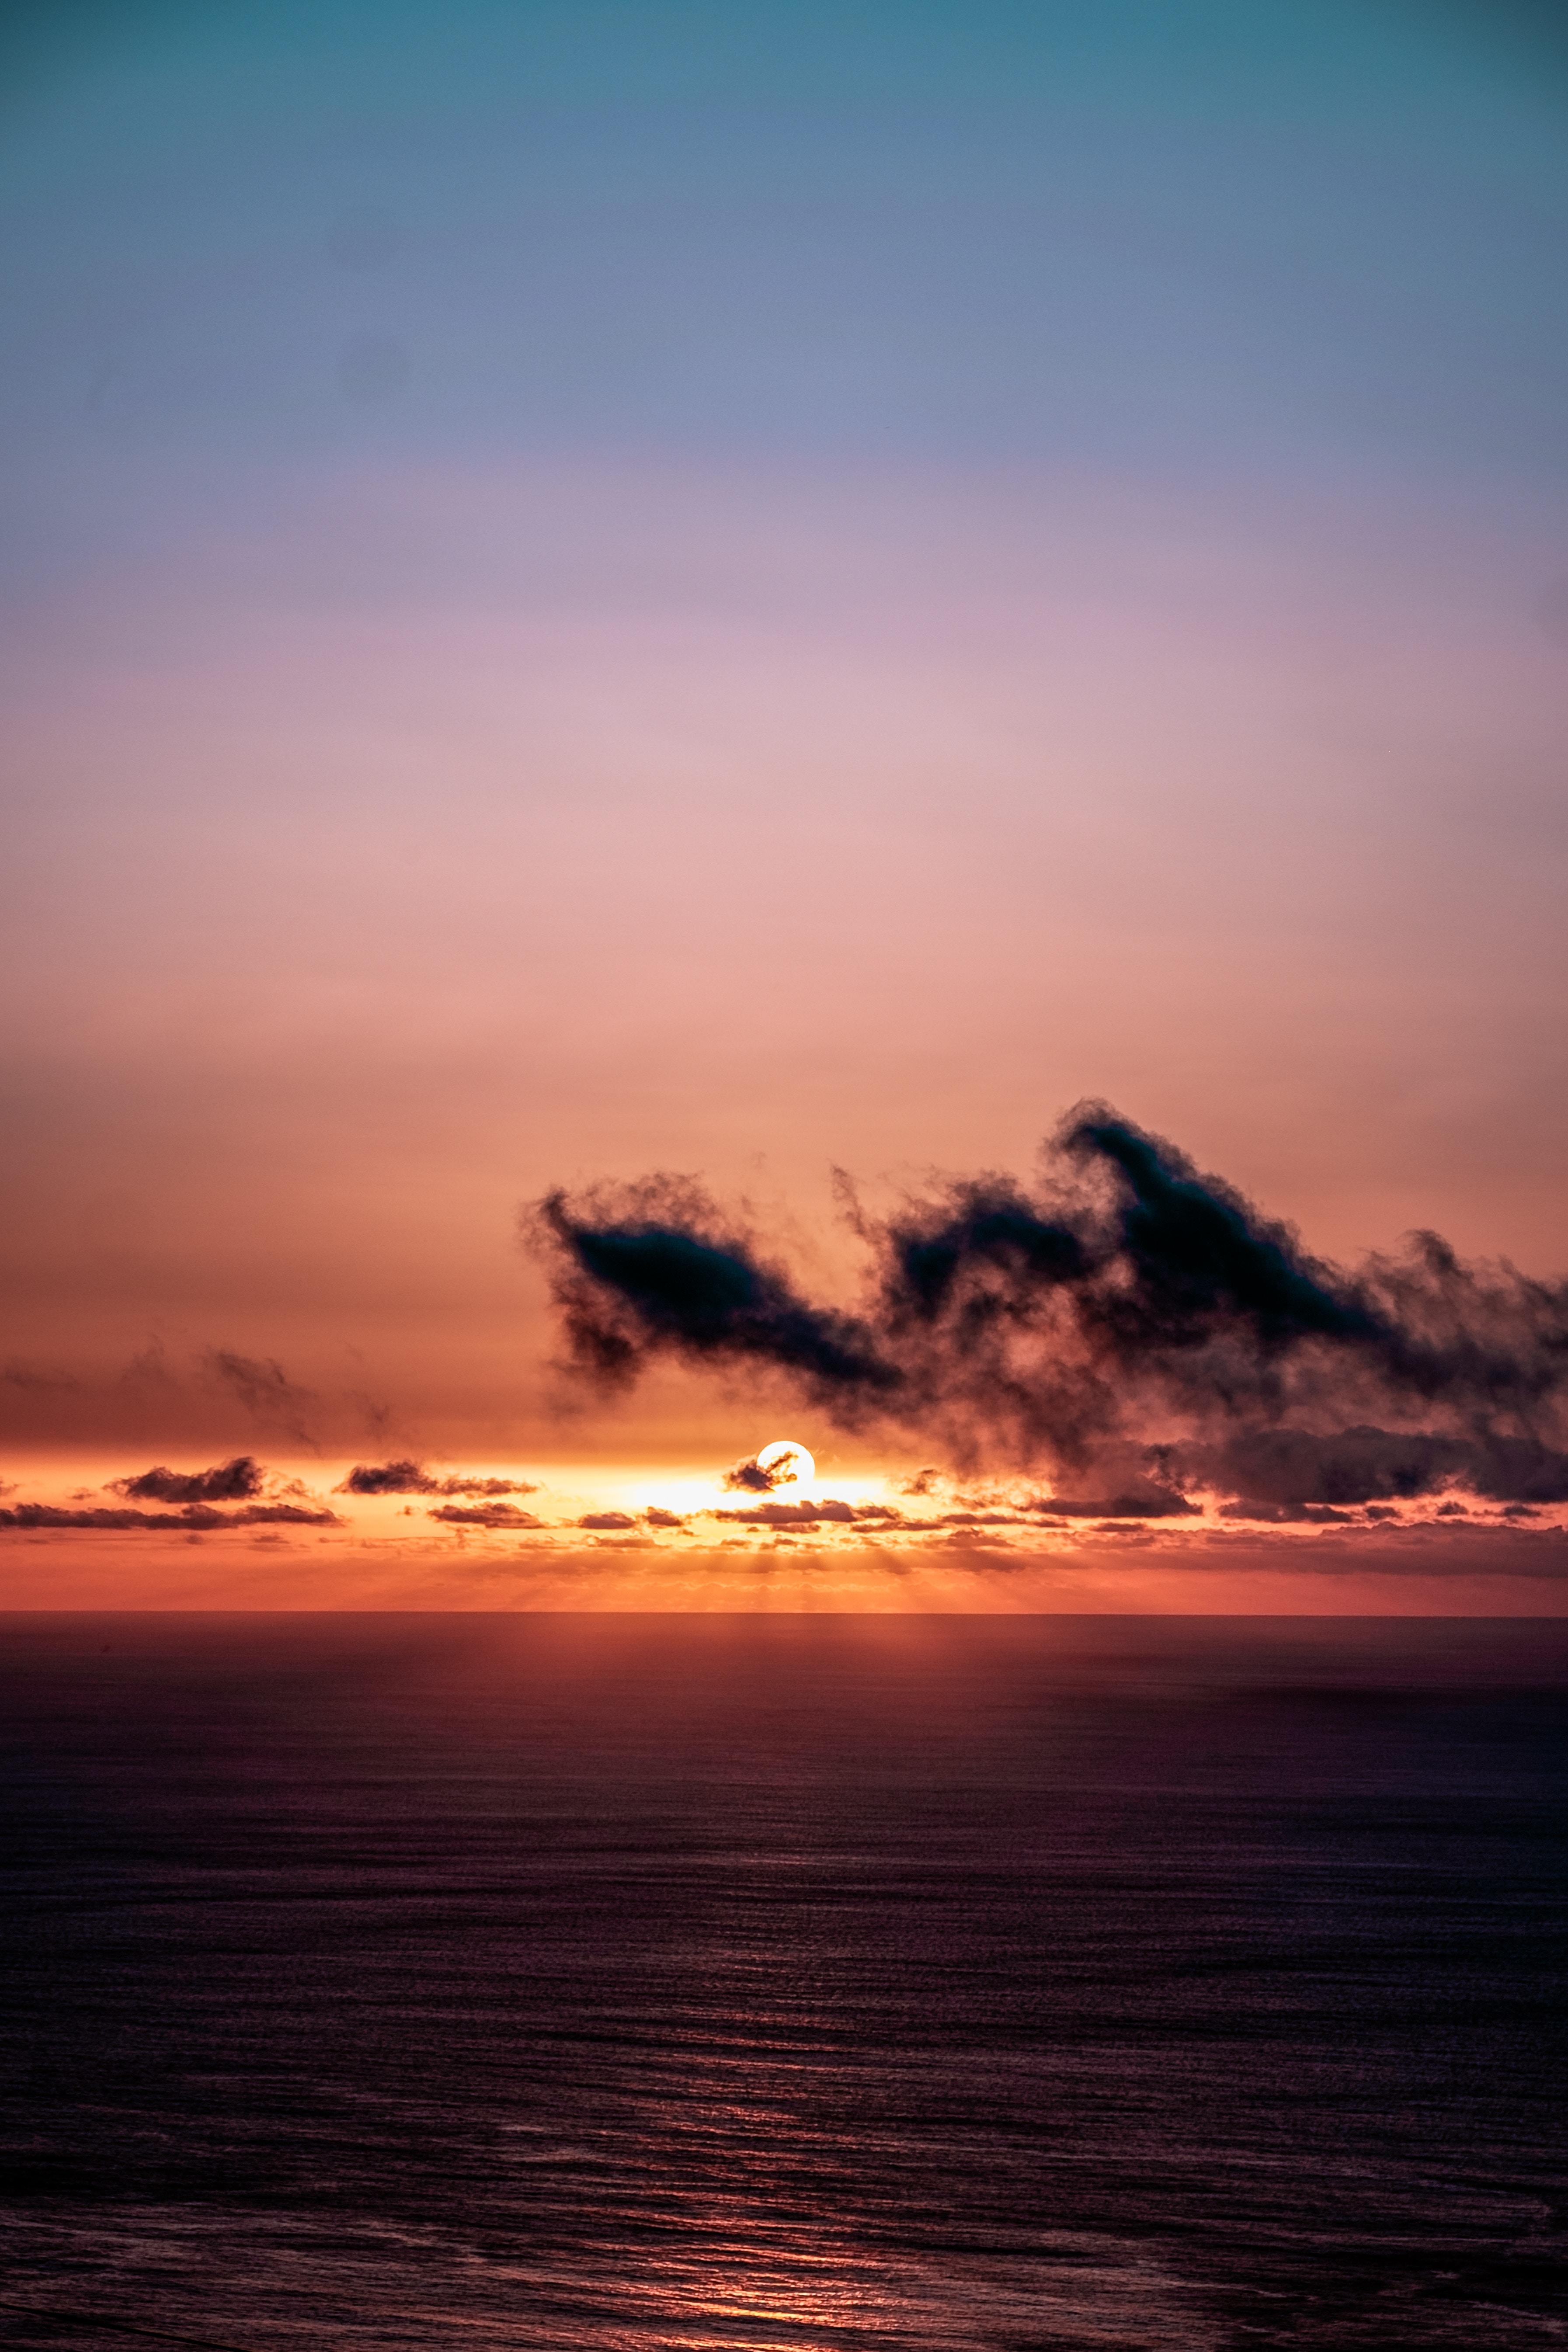 140491 Заставки и Обои Солнце на телефон. Скачать Природа, Закат, Небо, Море, Солнце, Облака, Горизонт, Темный картинки бесплатно